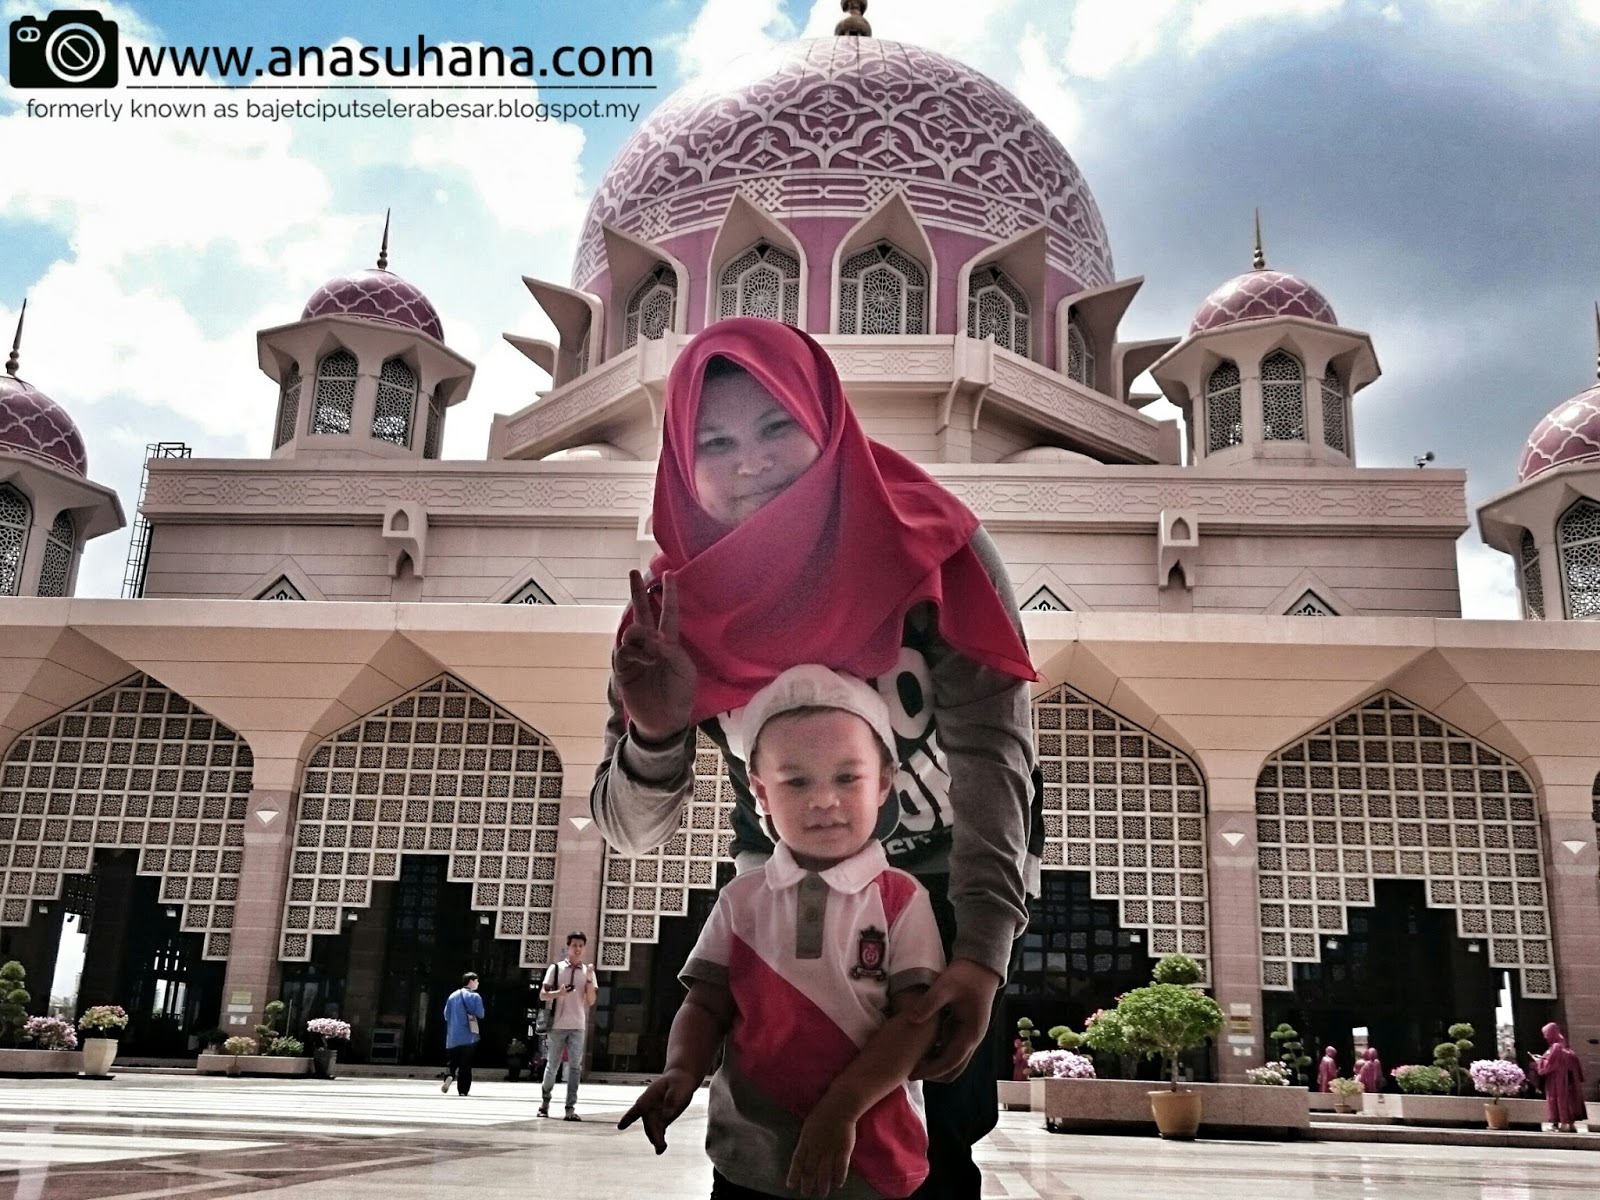 Tempat Menarik di Putrajaya : Masjid Putra